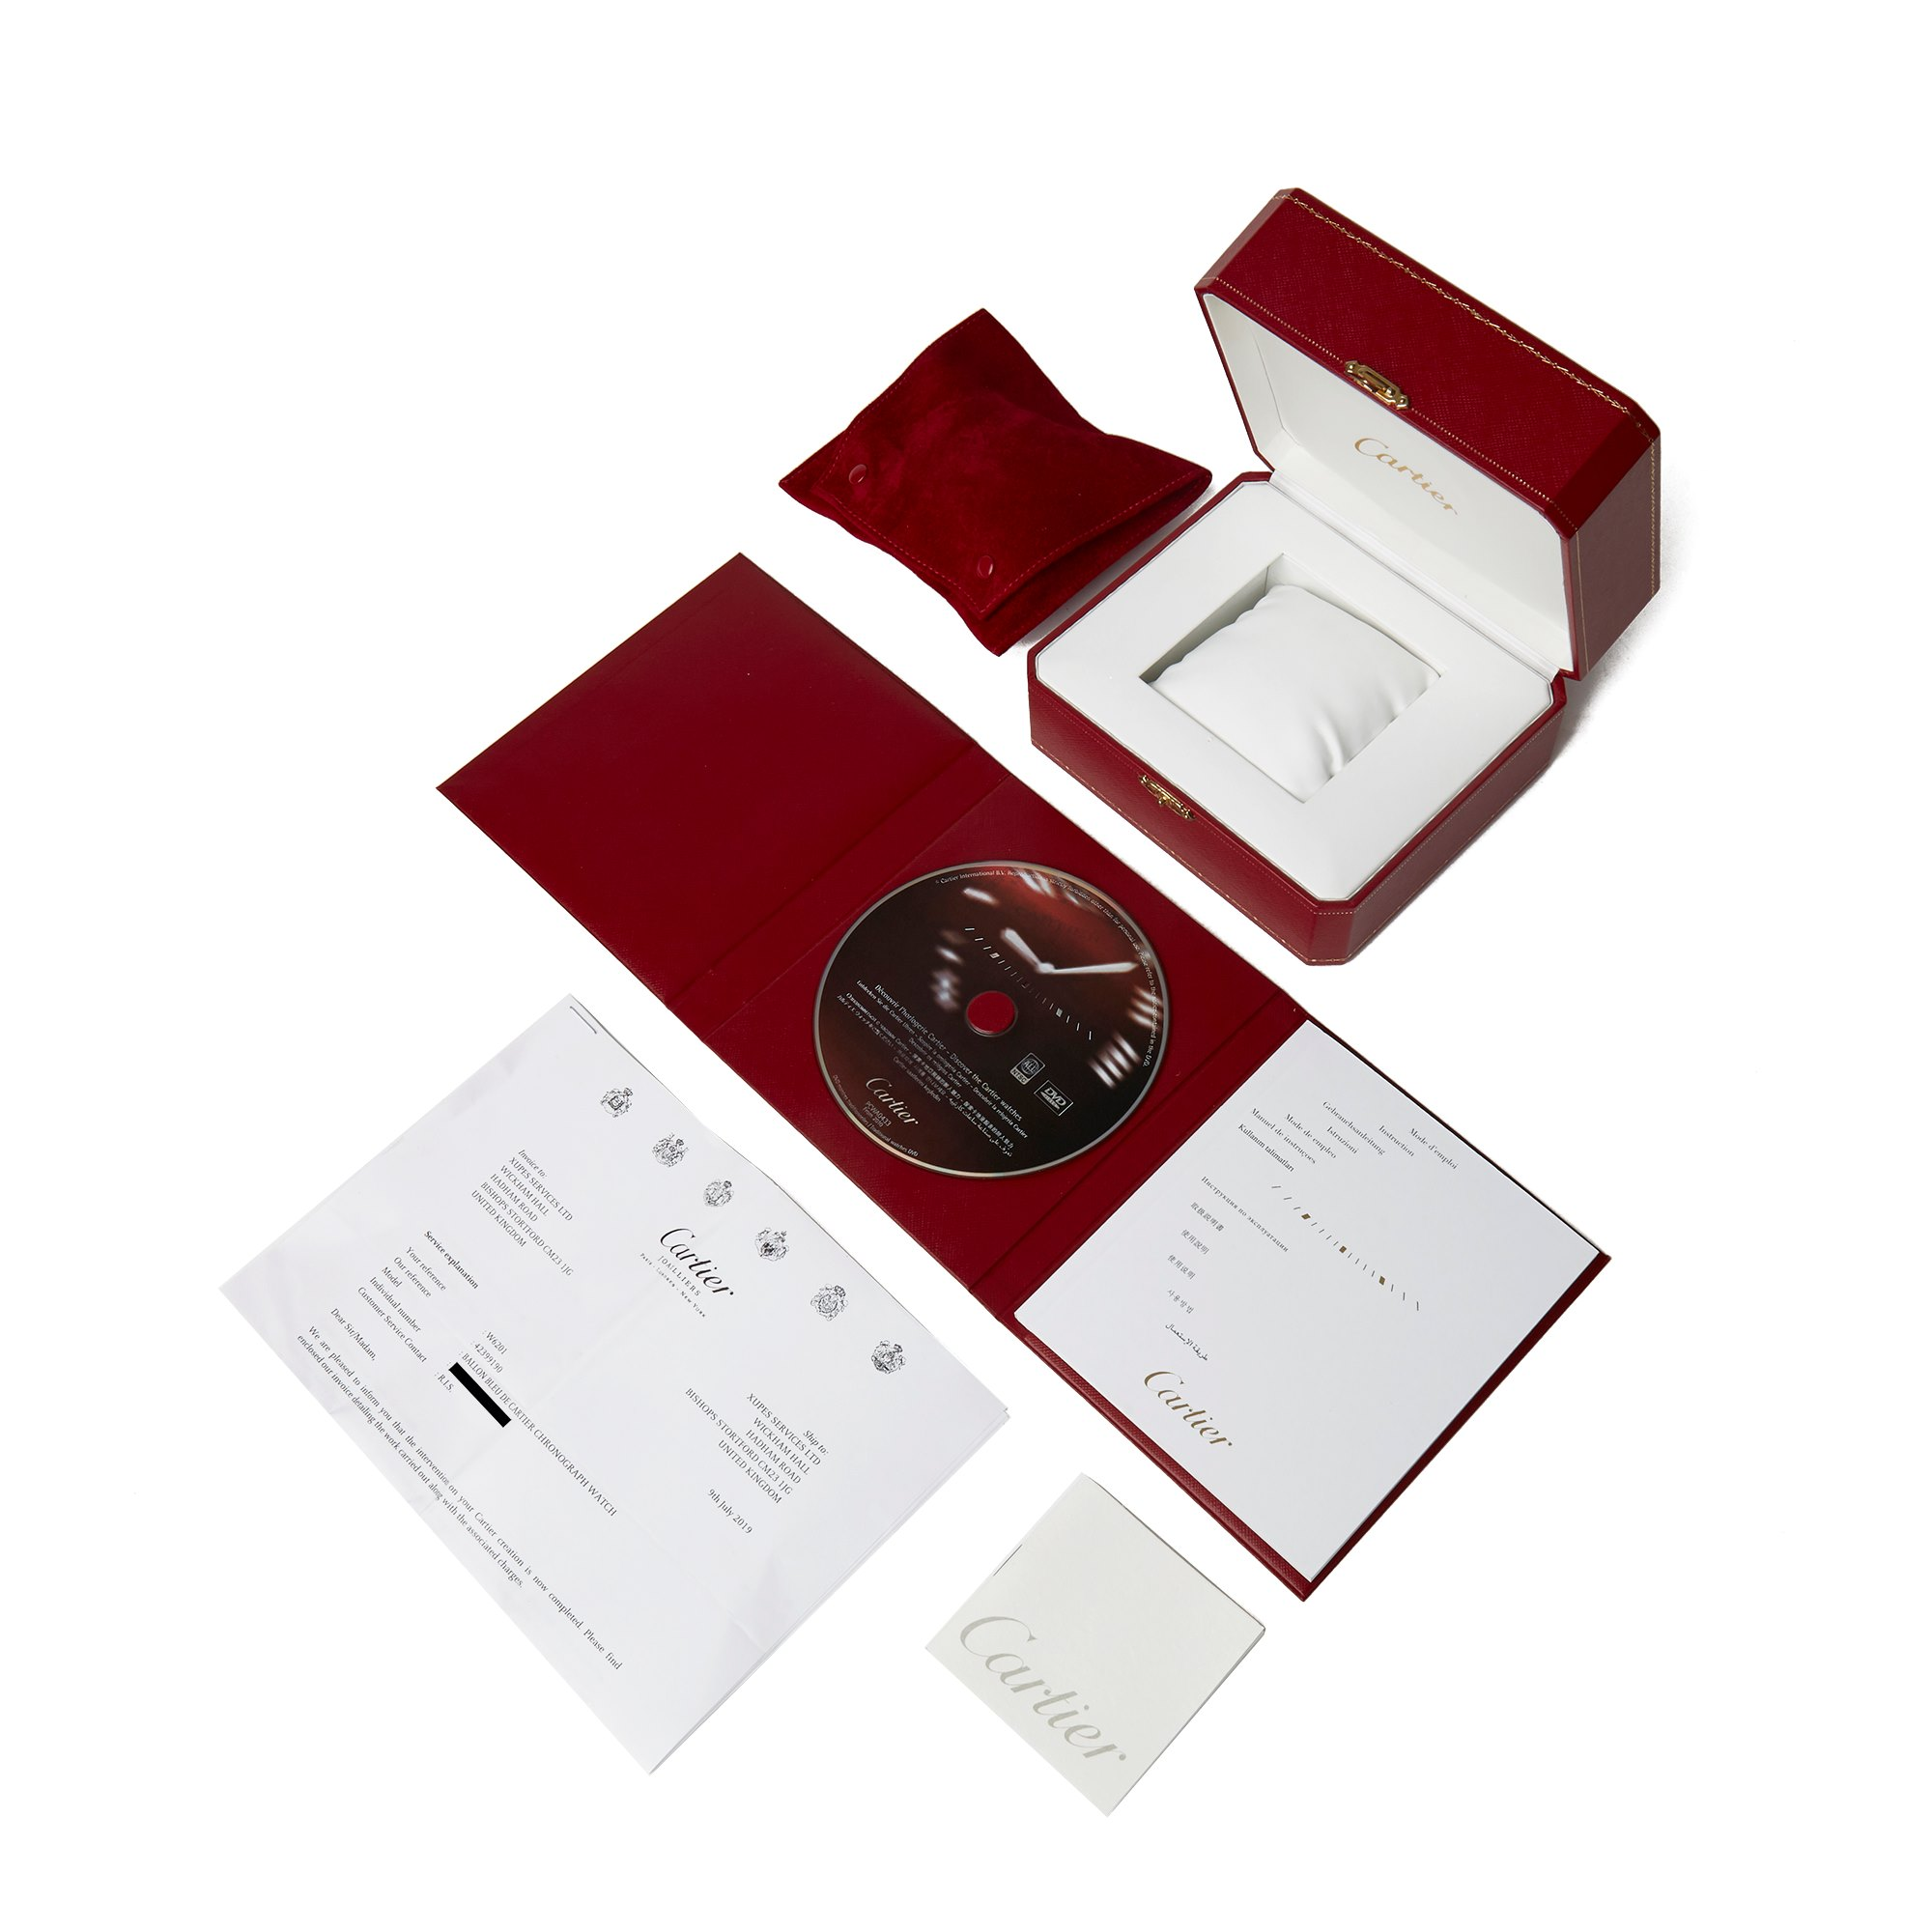 Cartier Ballon Bleu XL Chronograph Stainless Steel W6920003 or 3109